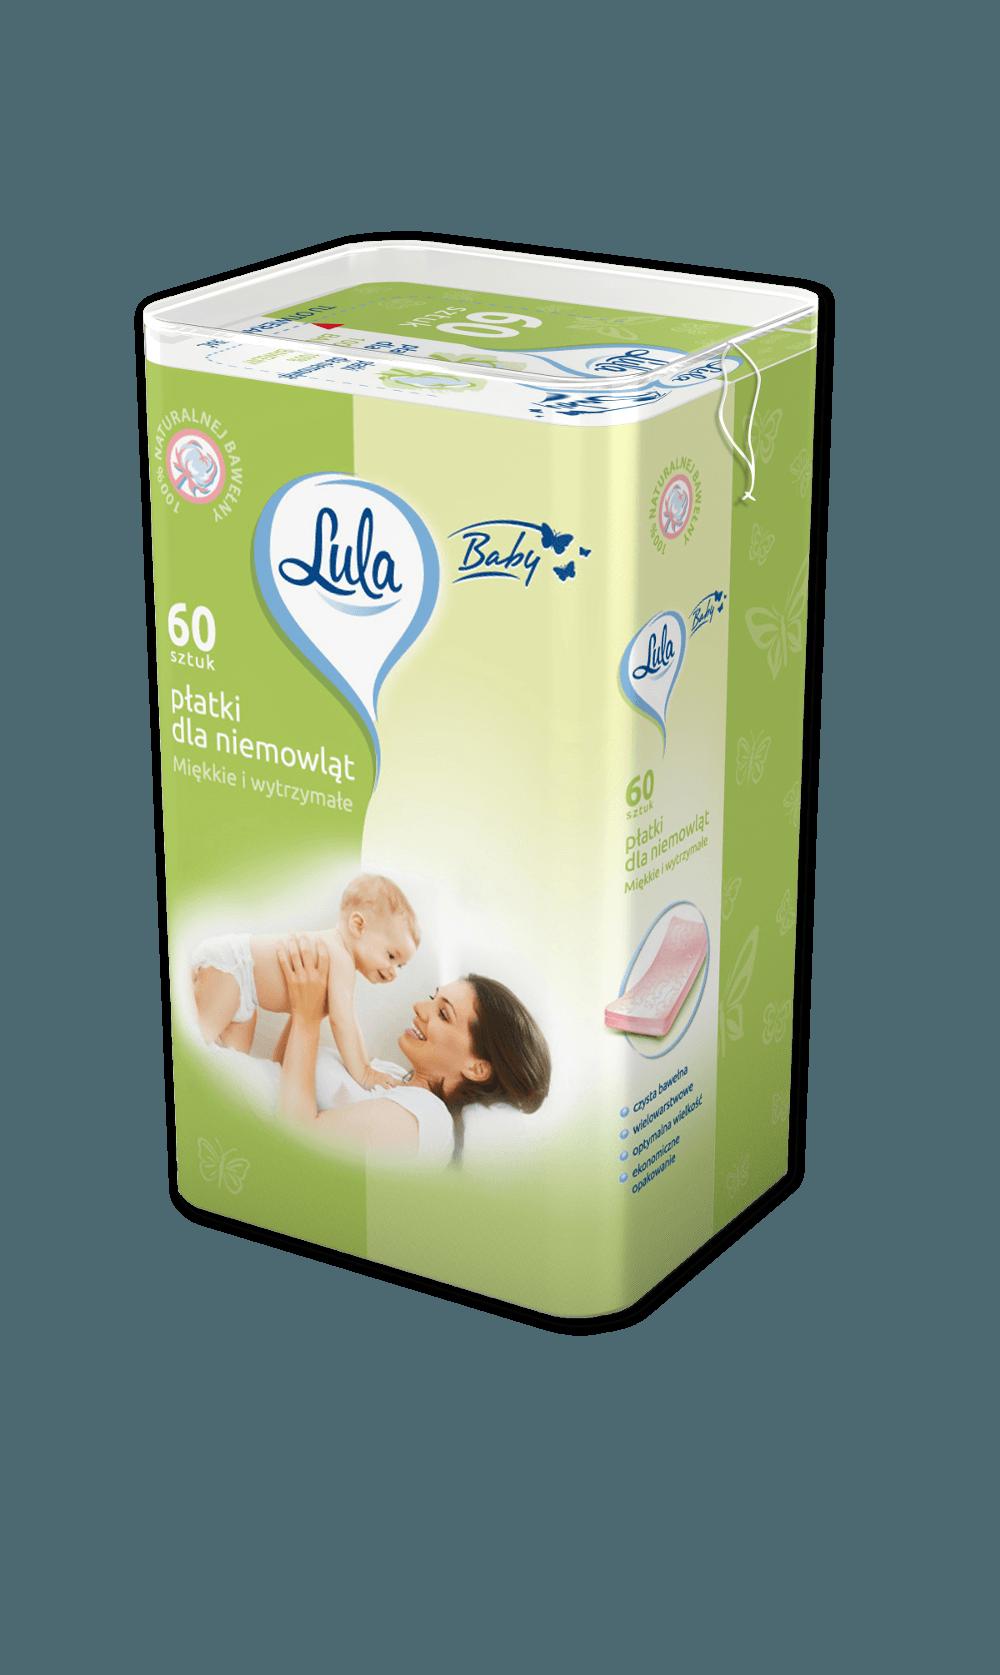 Płatki dla niemowląt 60 szt. (VAT 8%) LULA BABY